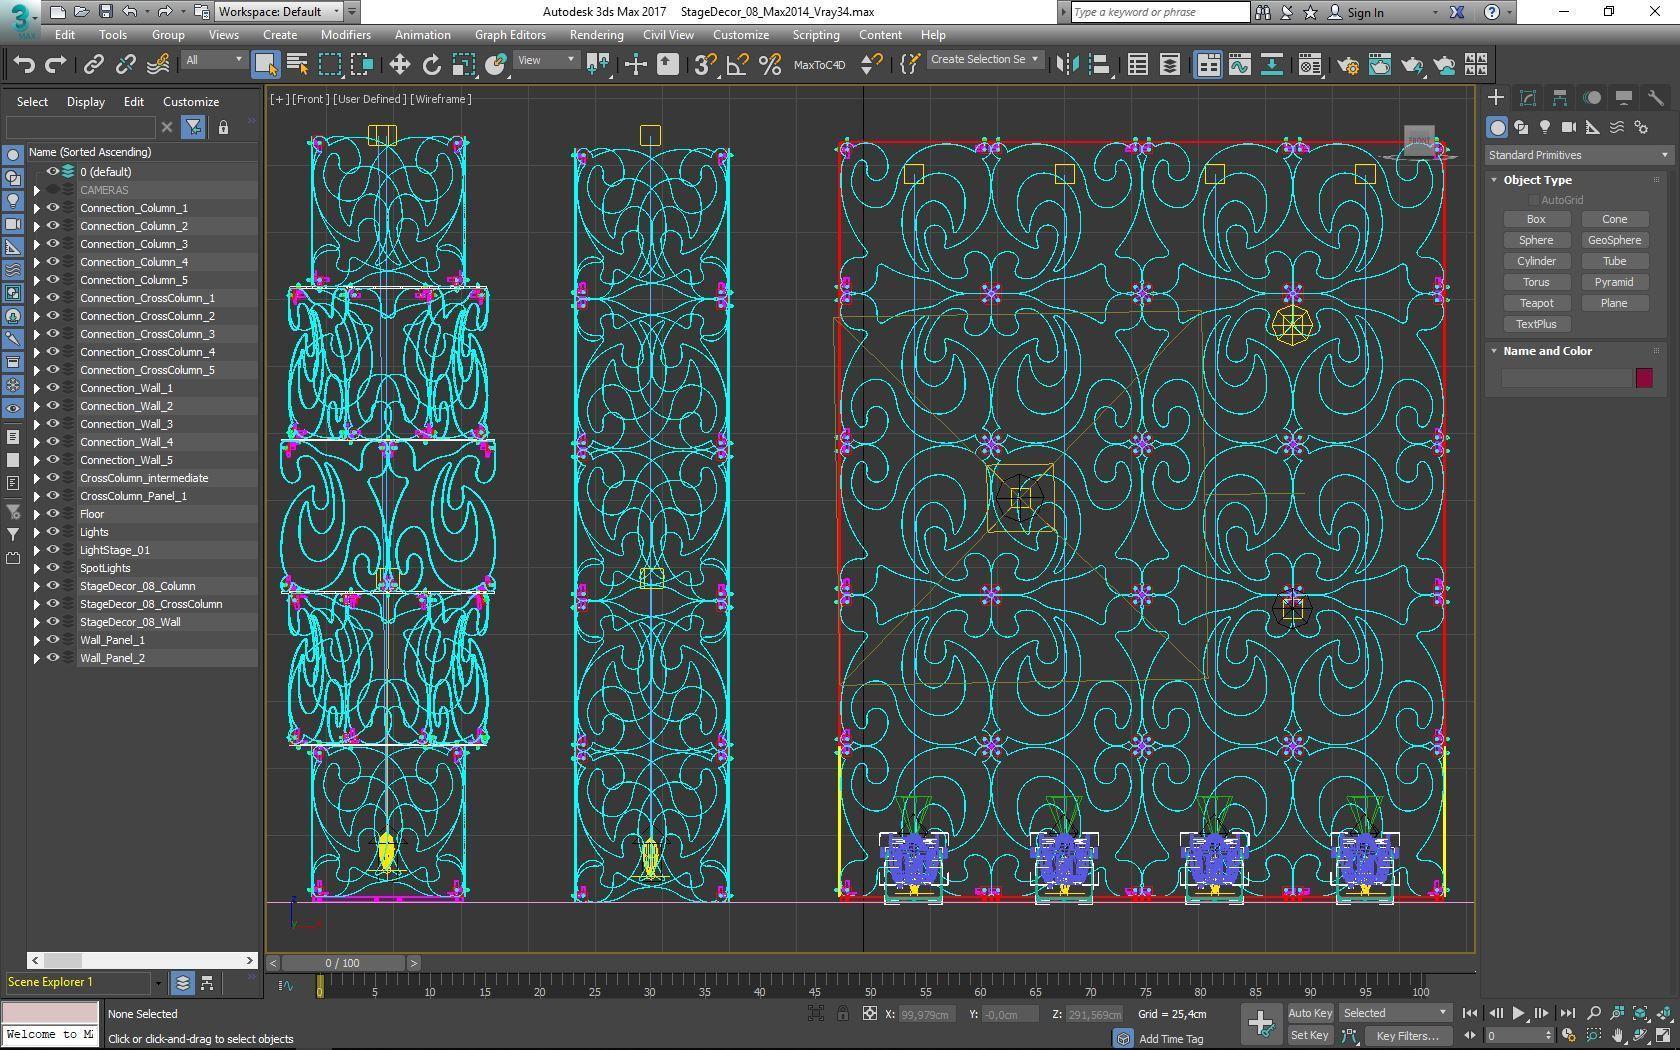 70-Max-08-02-1680.JPG Download STL file Stage Decor Collection 01 (Modular 9 Pieces) • 3D printer model, akerStudio